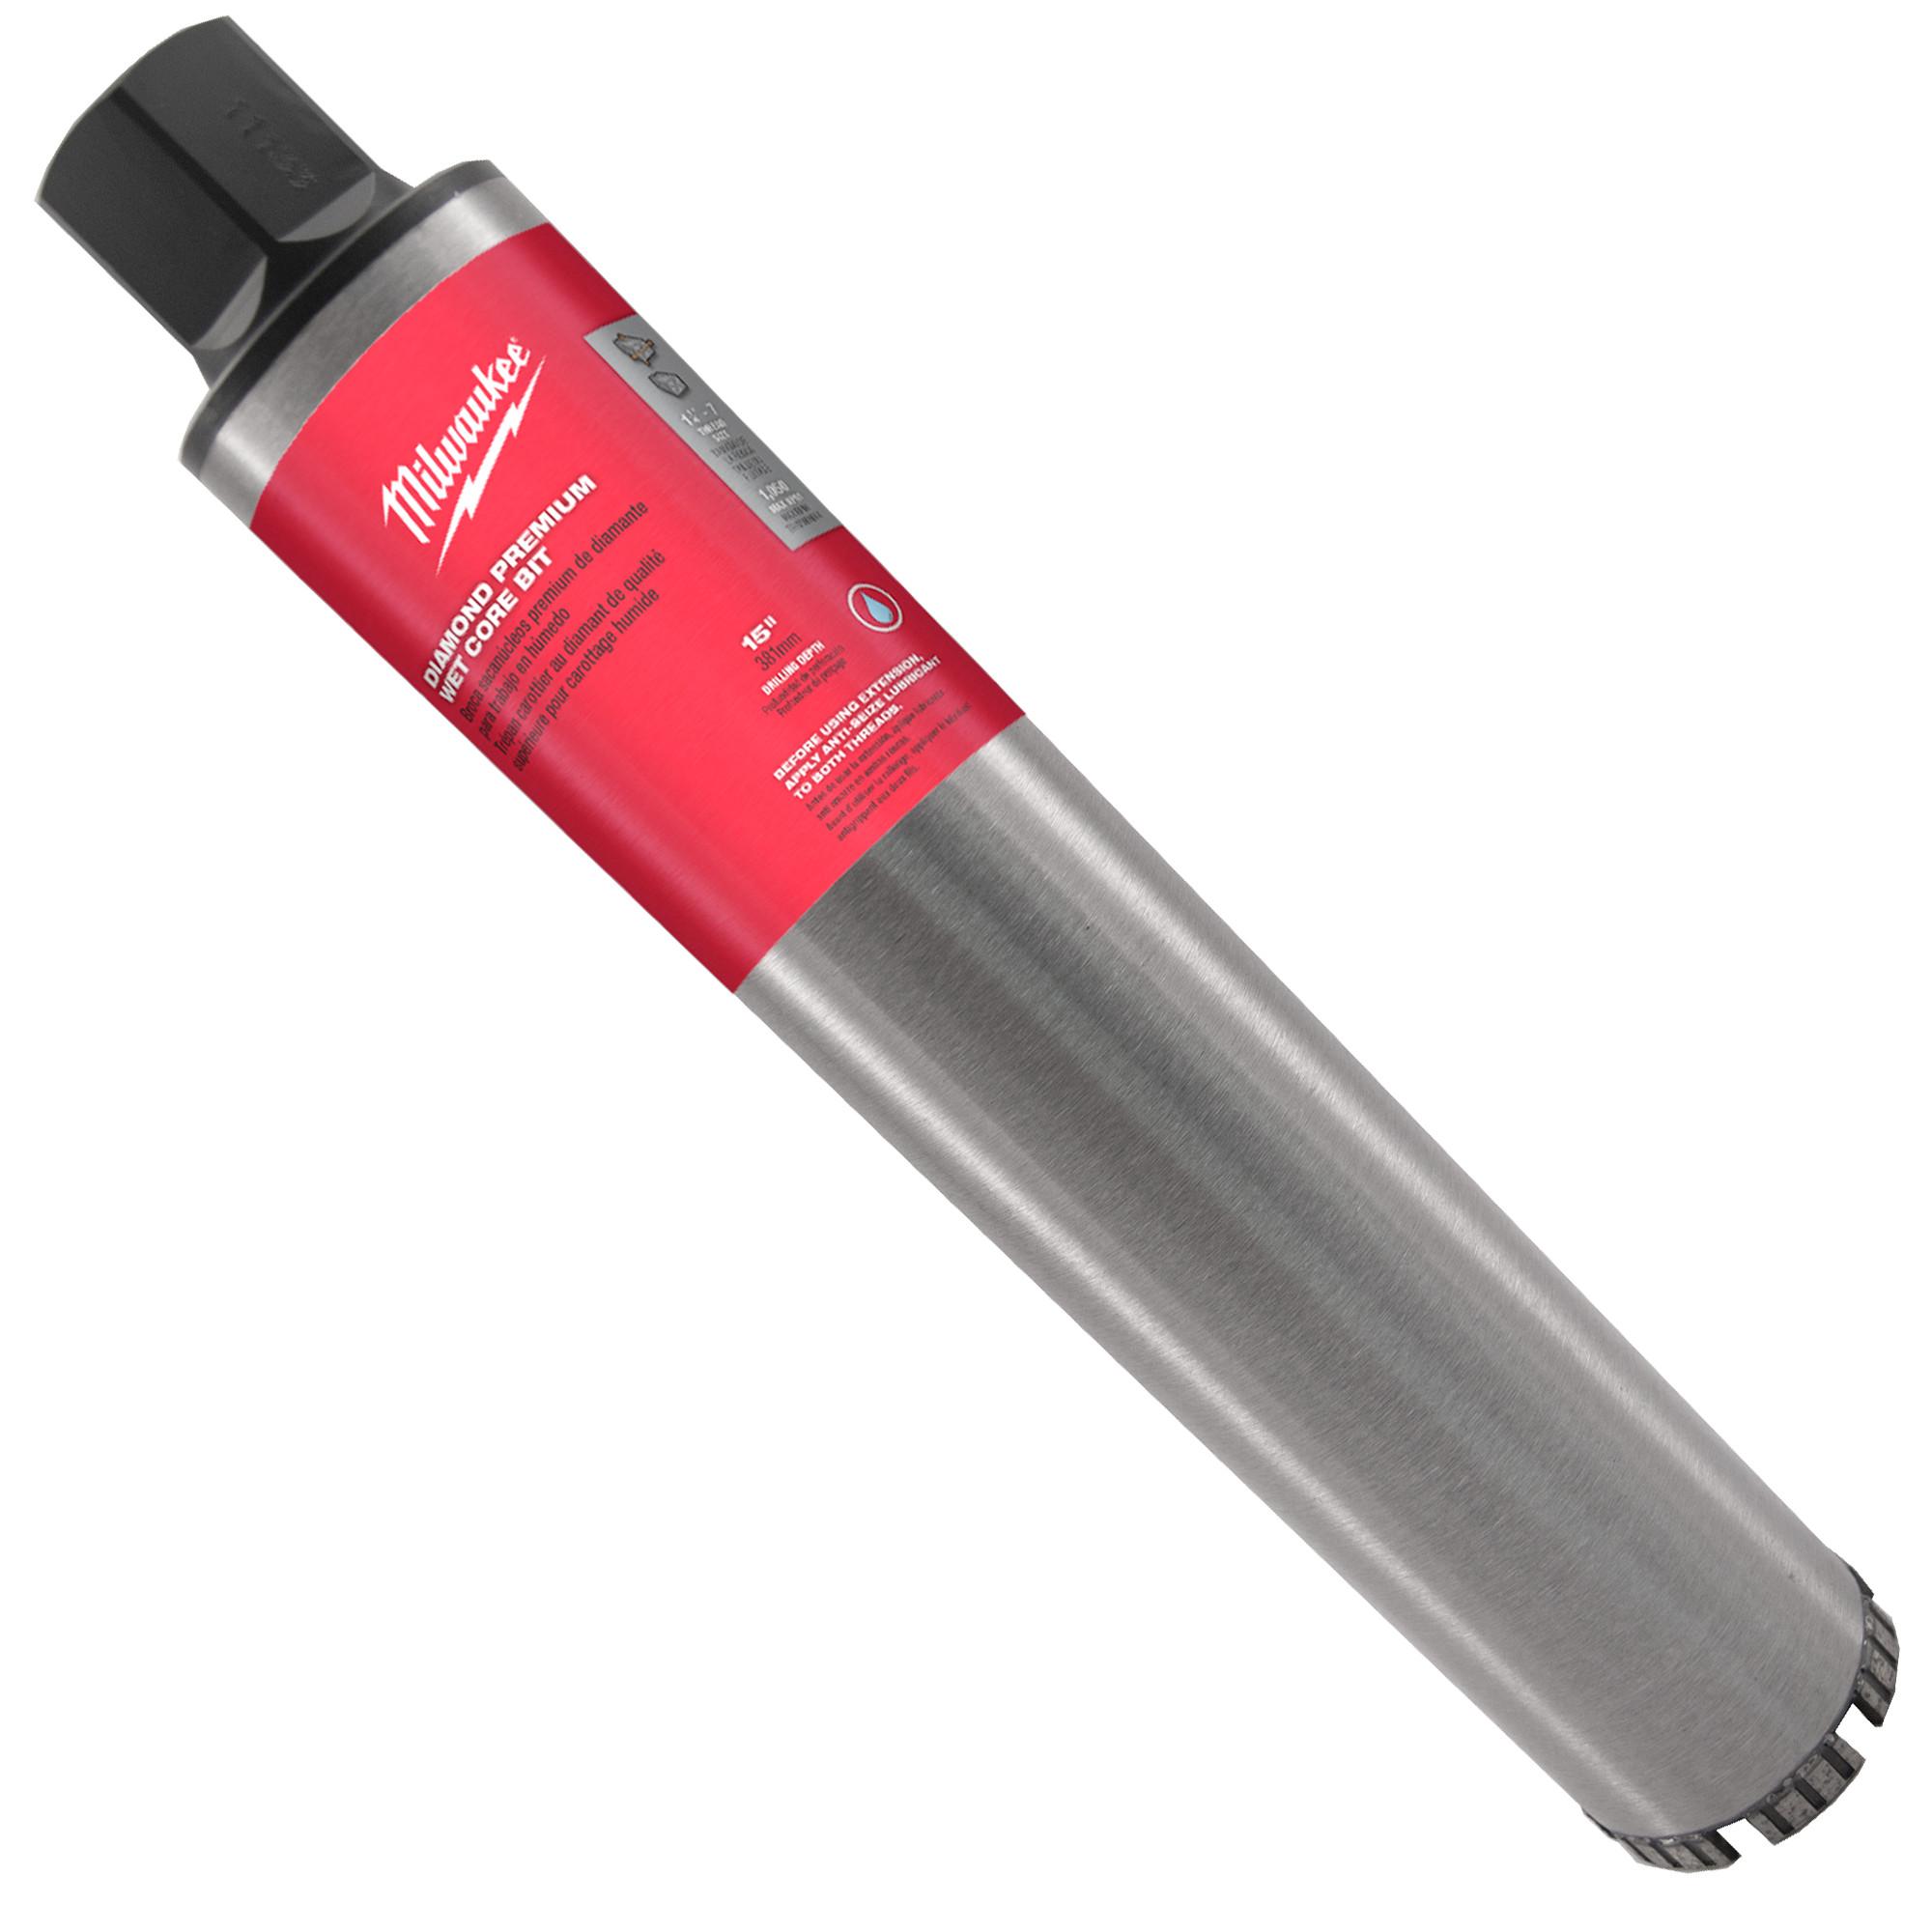 Milwaukee® 48-17-3035 Premium Grade Wet Core Bit, 3-1/2 in Drill - Fraction, 3.5 in Drill - Decimal Inch